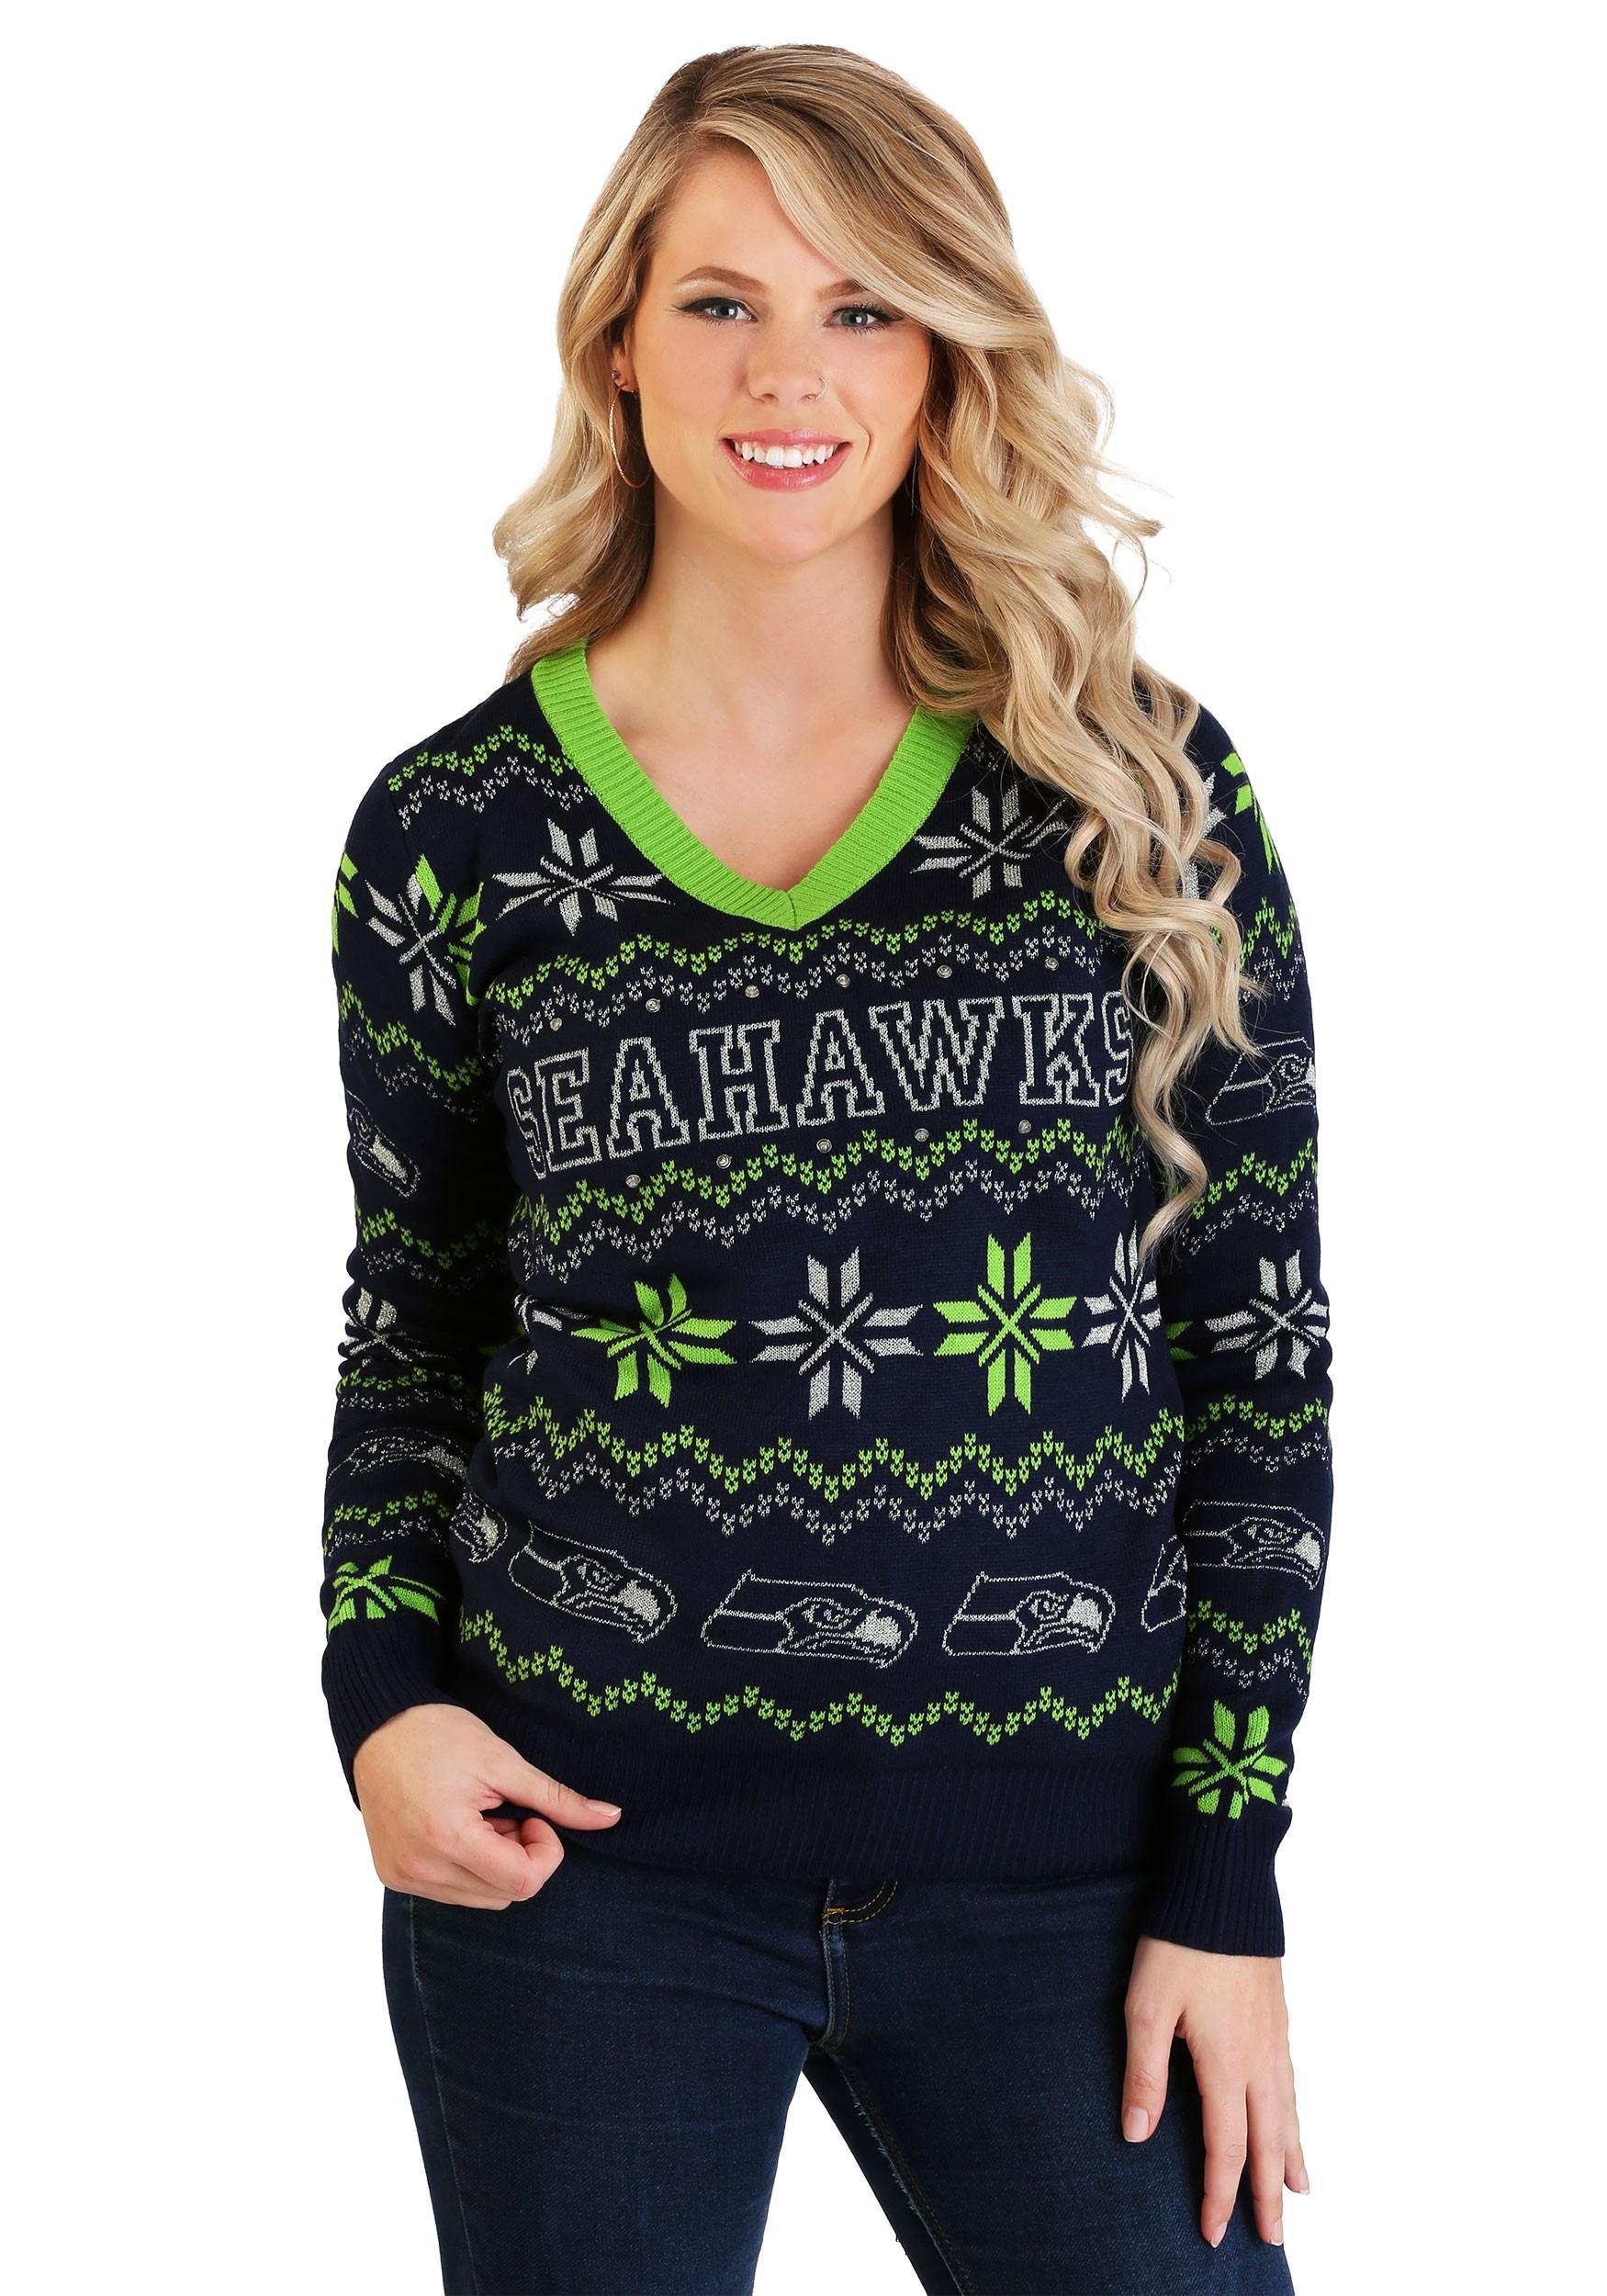 official photos 94a19 5d68f Seattle Seahawks Women's Light Up V-Neck Bluetooth Sweater